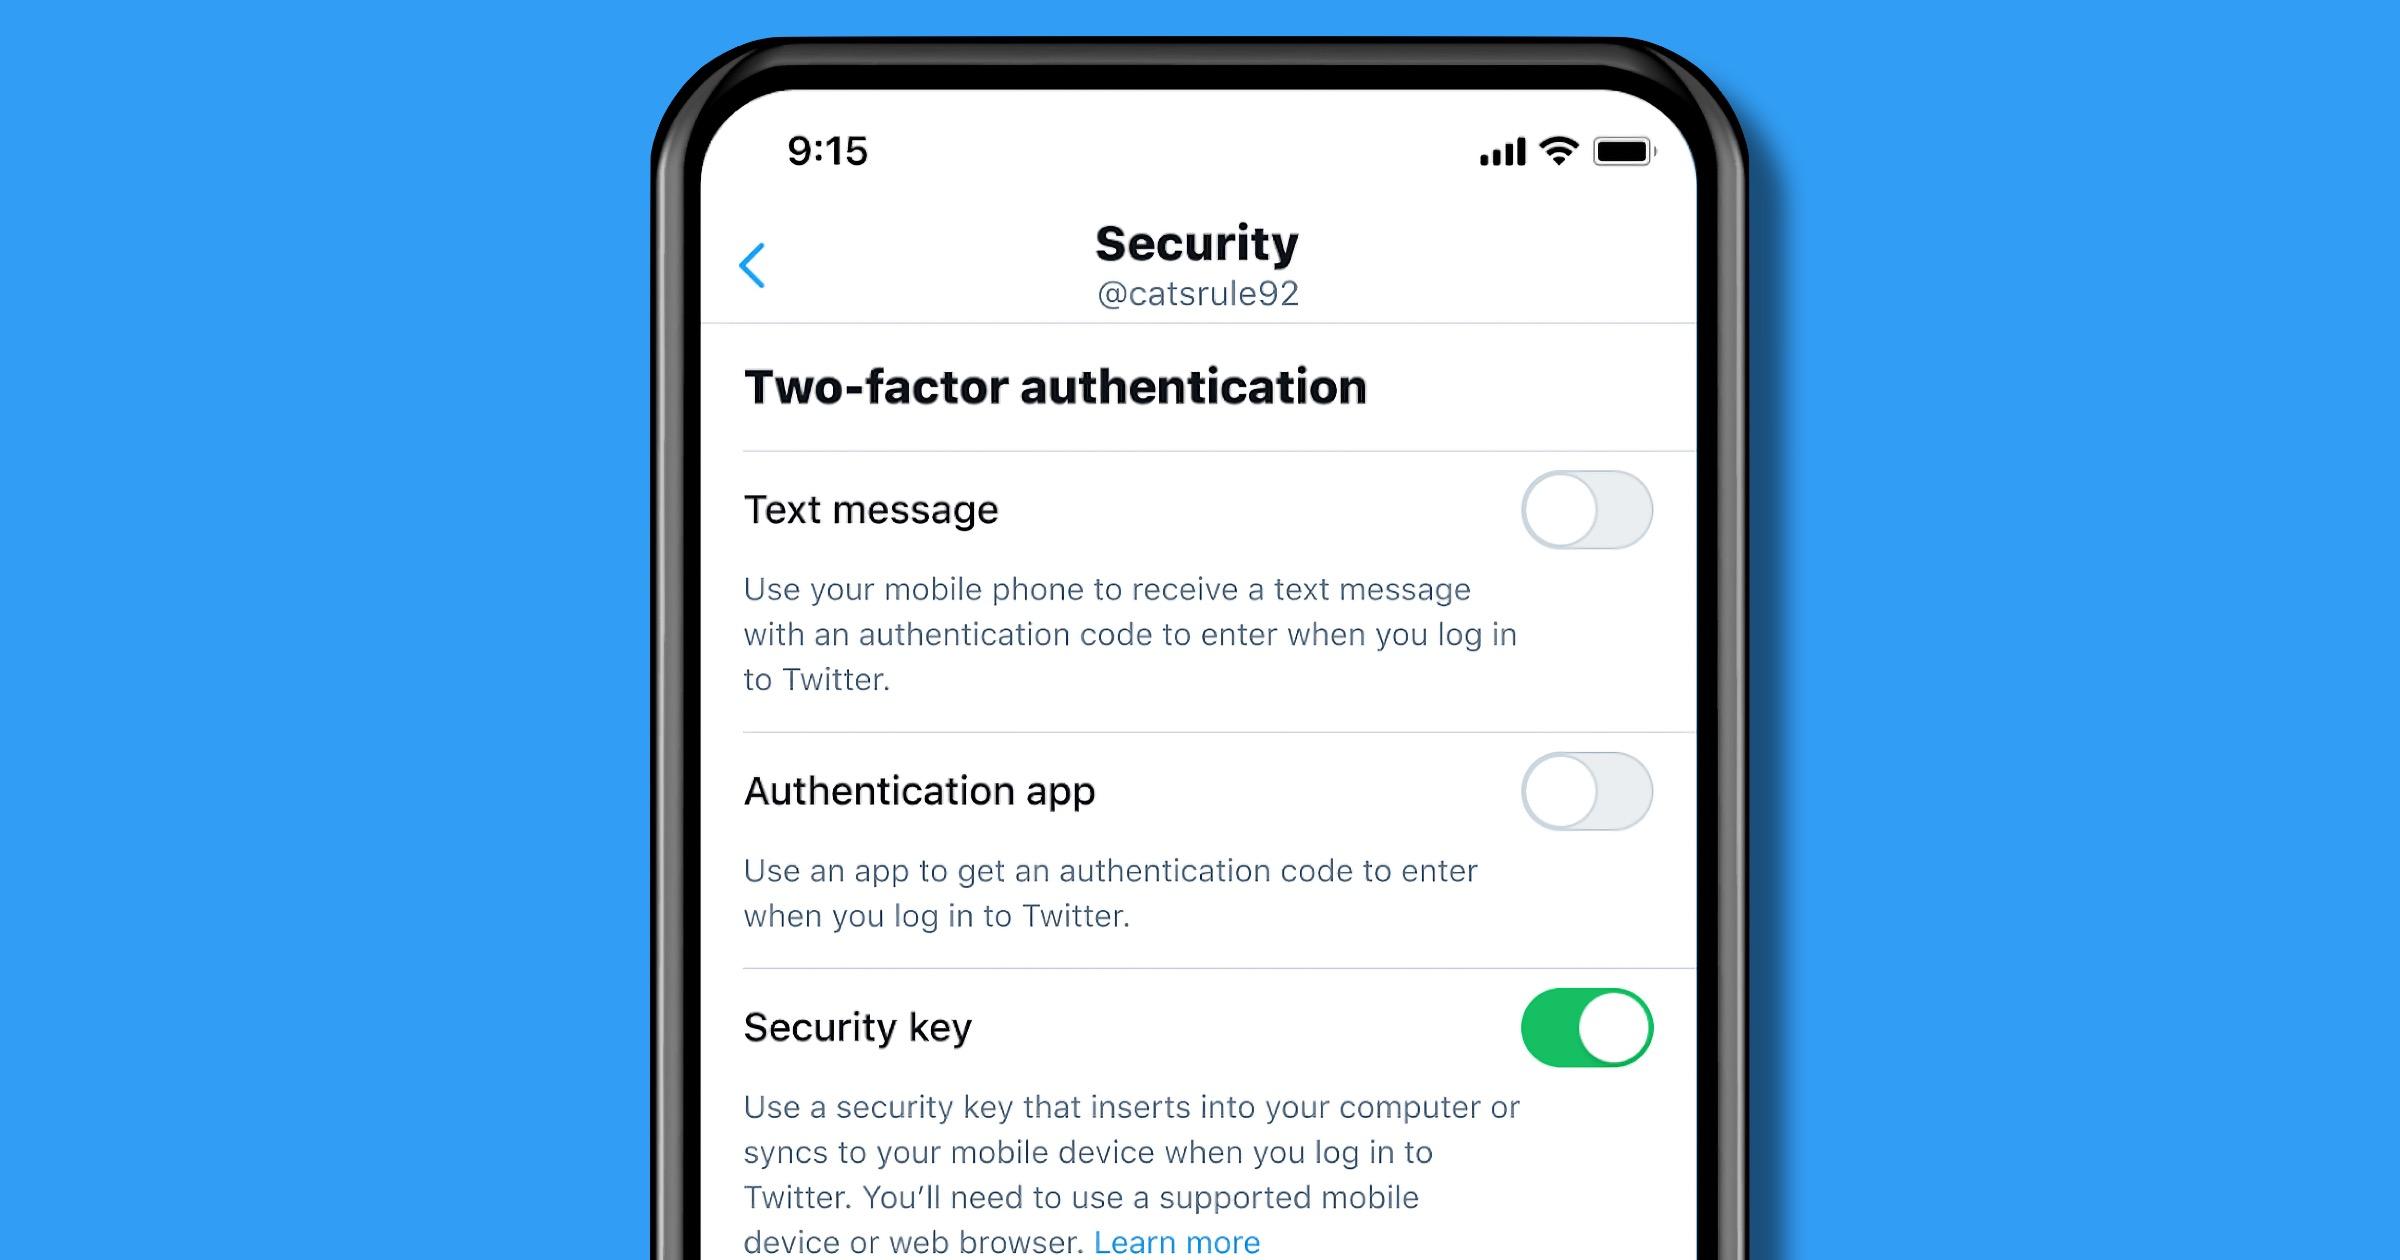 Twitter 2FA security keys